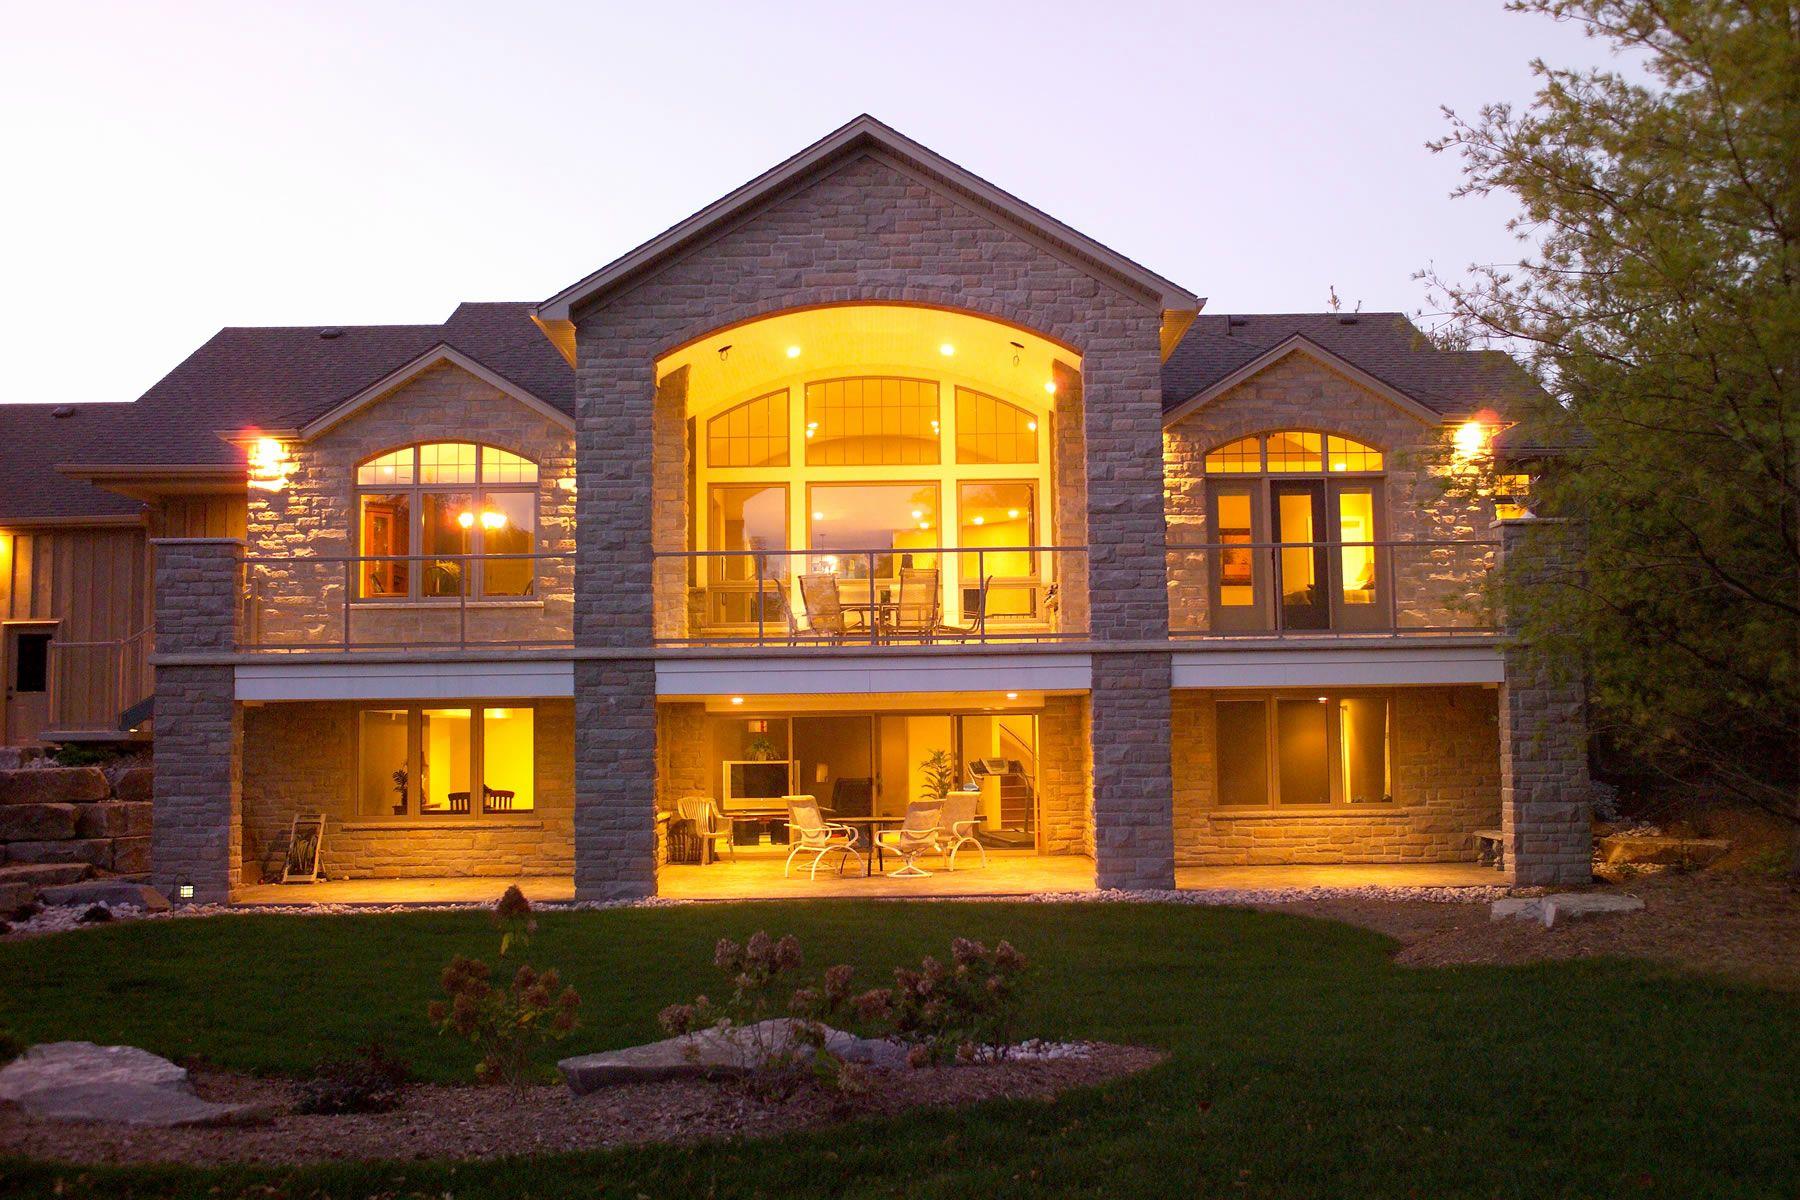 Pool Design Plans House Plans Walkout Basement Daylight